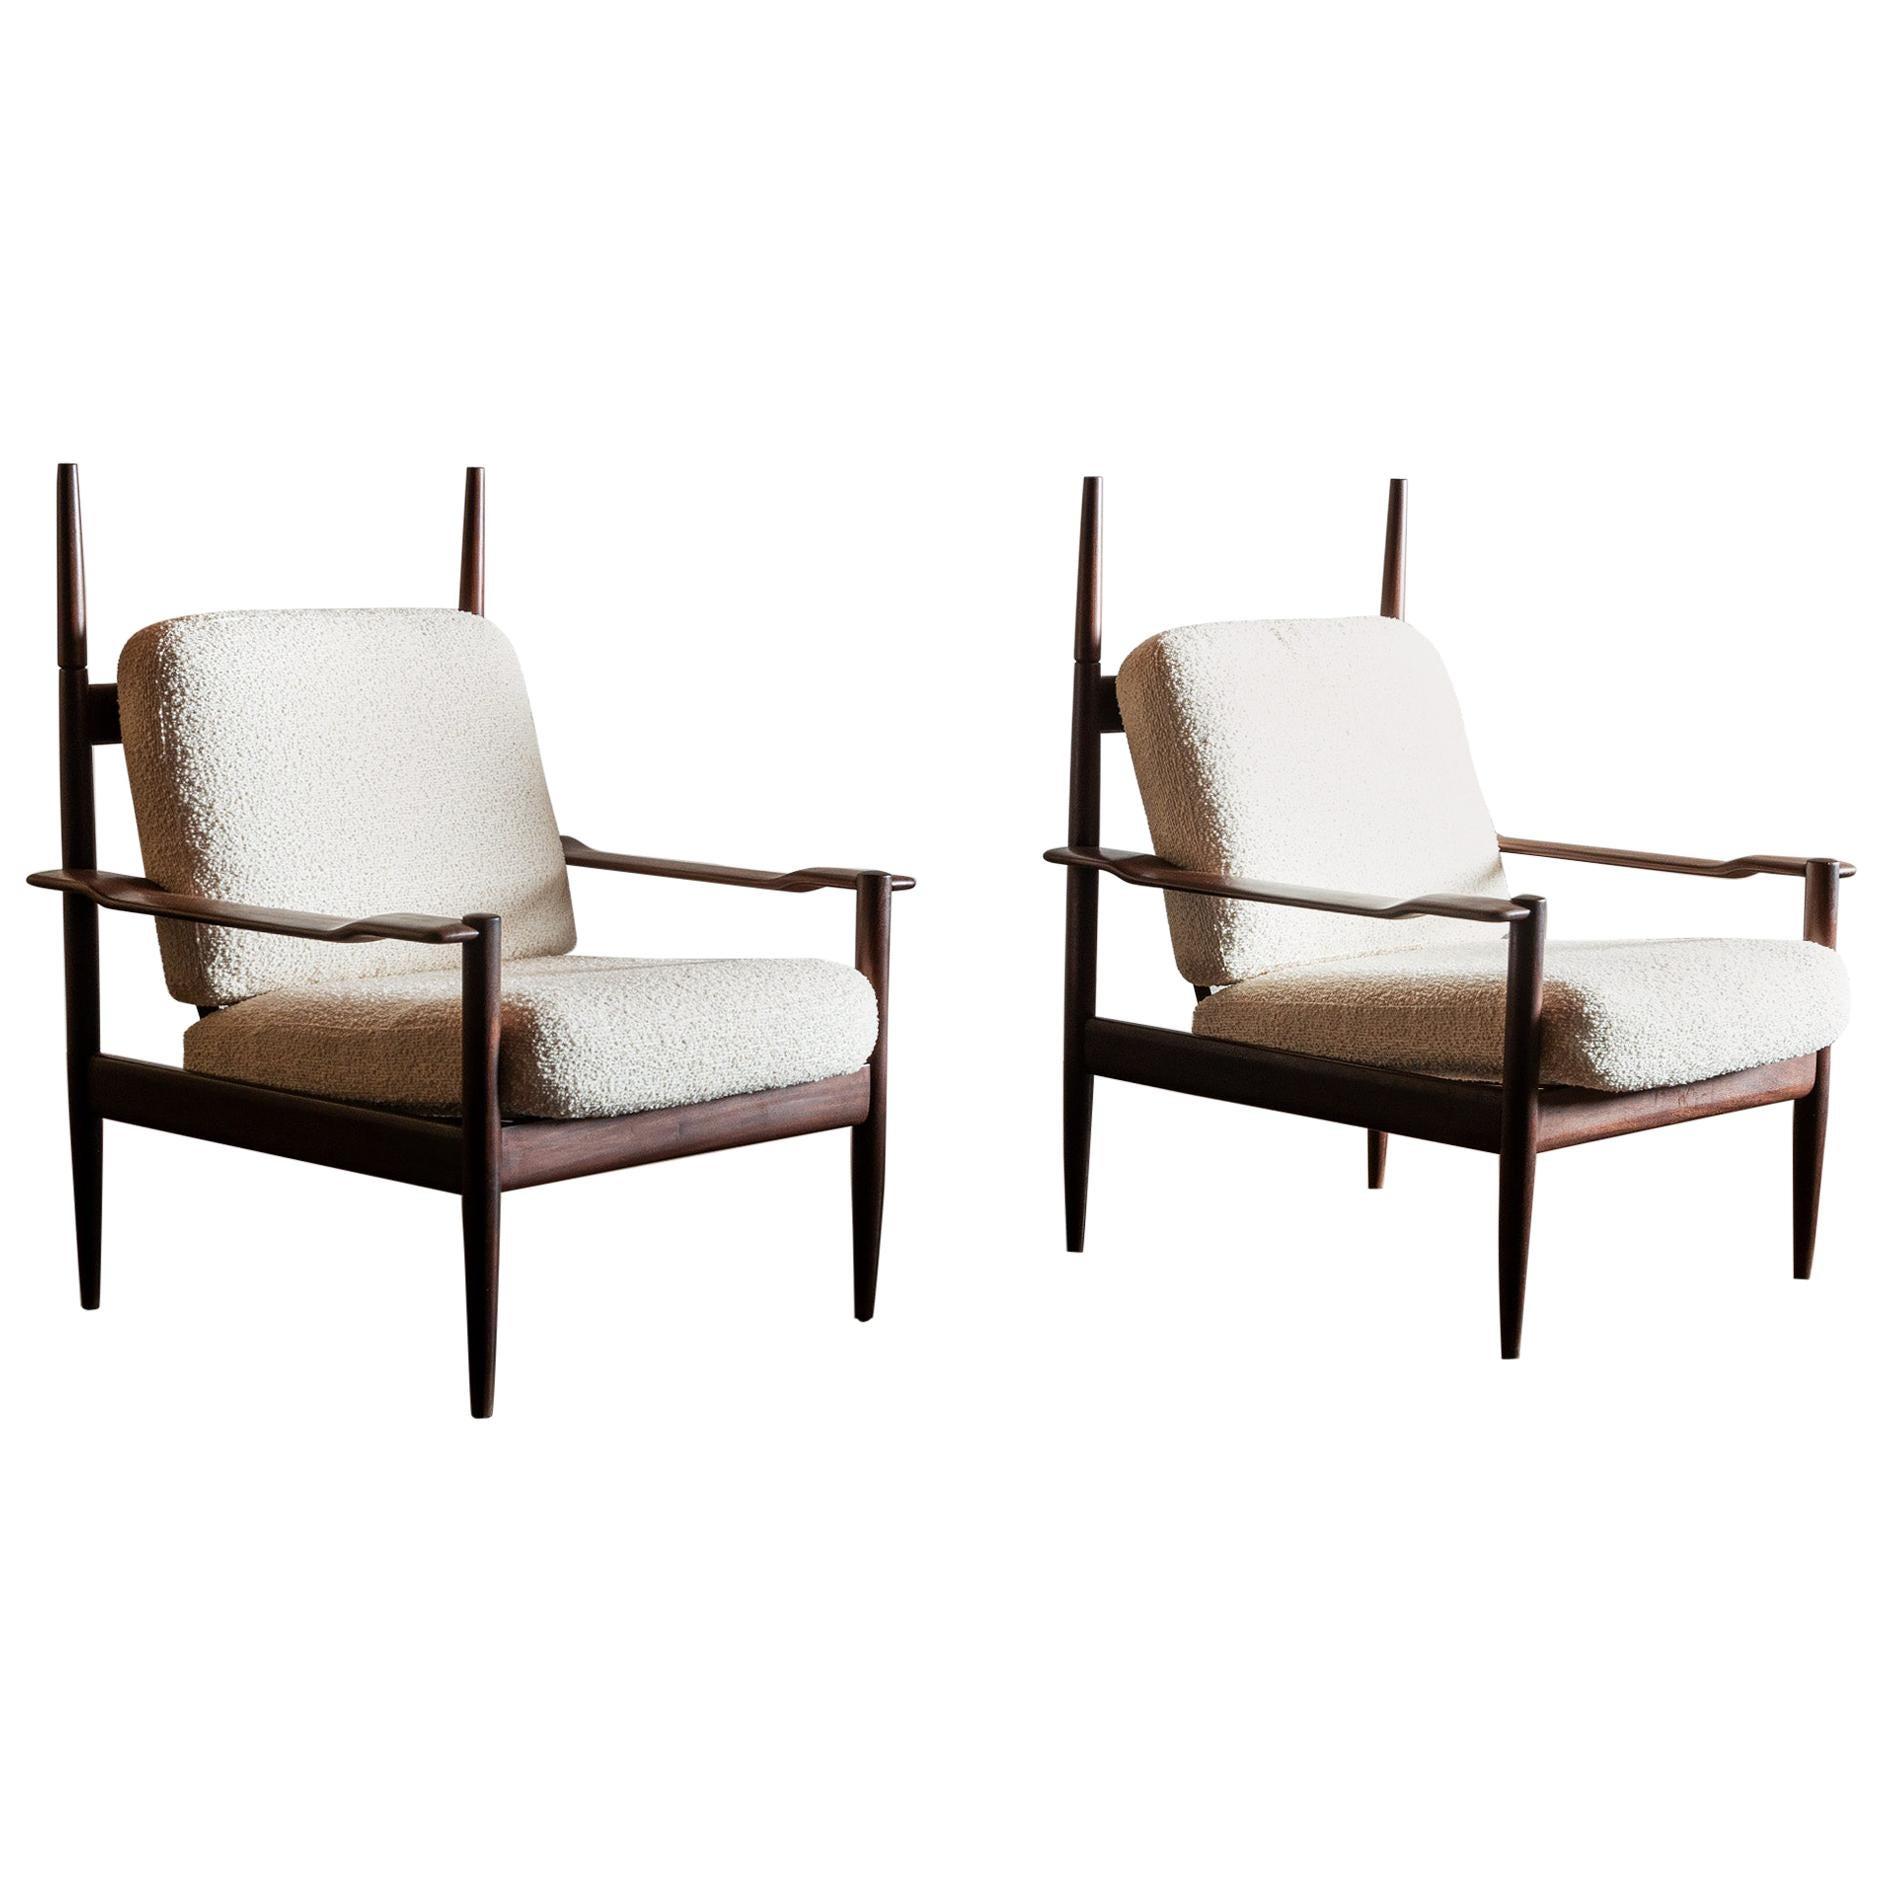 Pair of Sculptural Teak Brazilian Chairs, 1960s